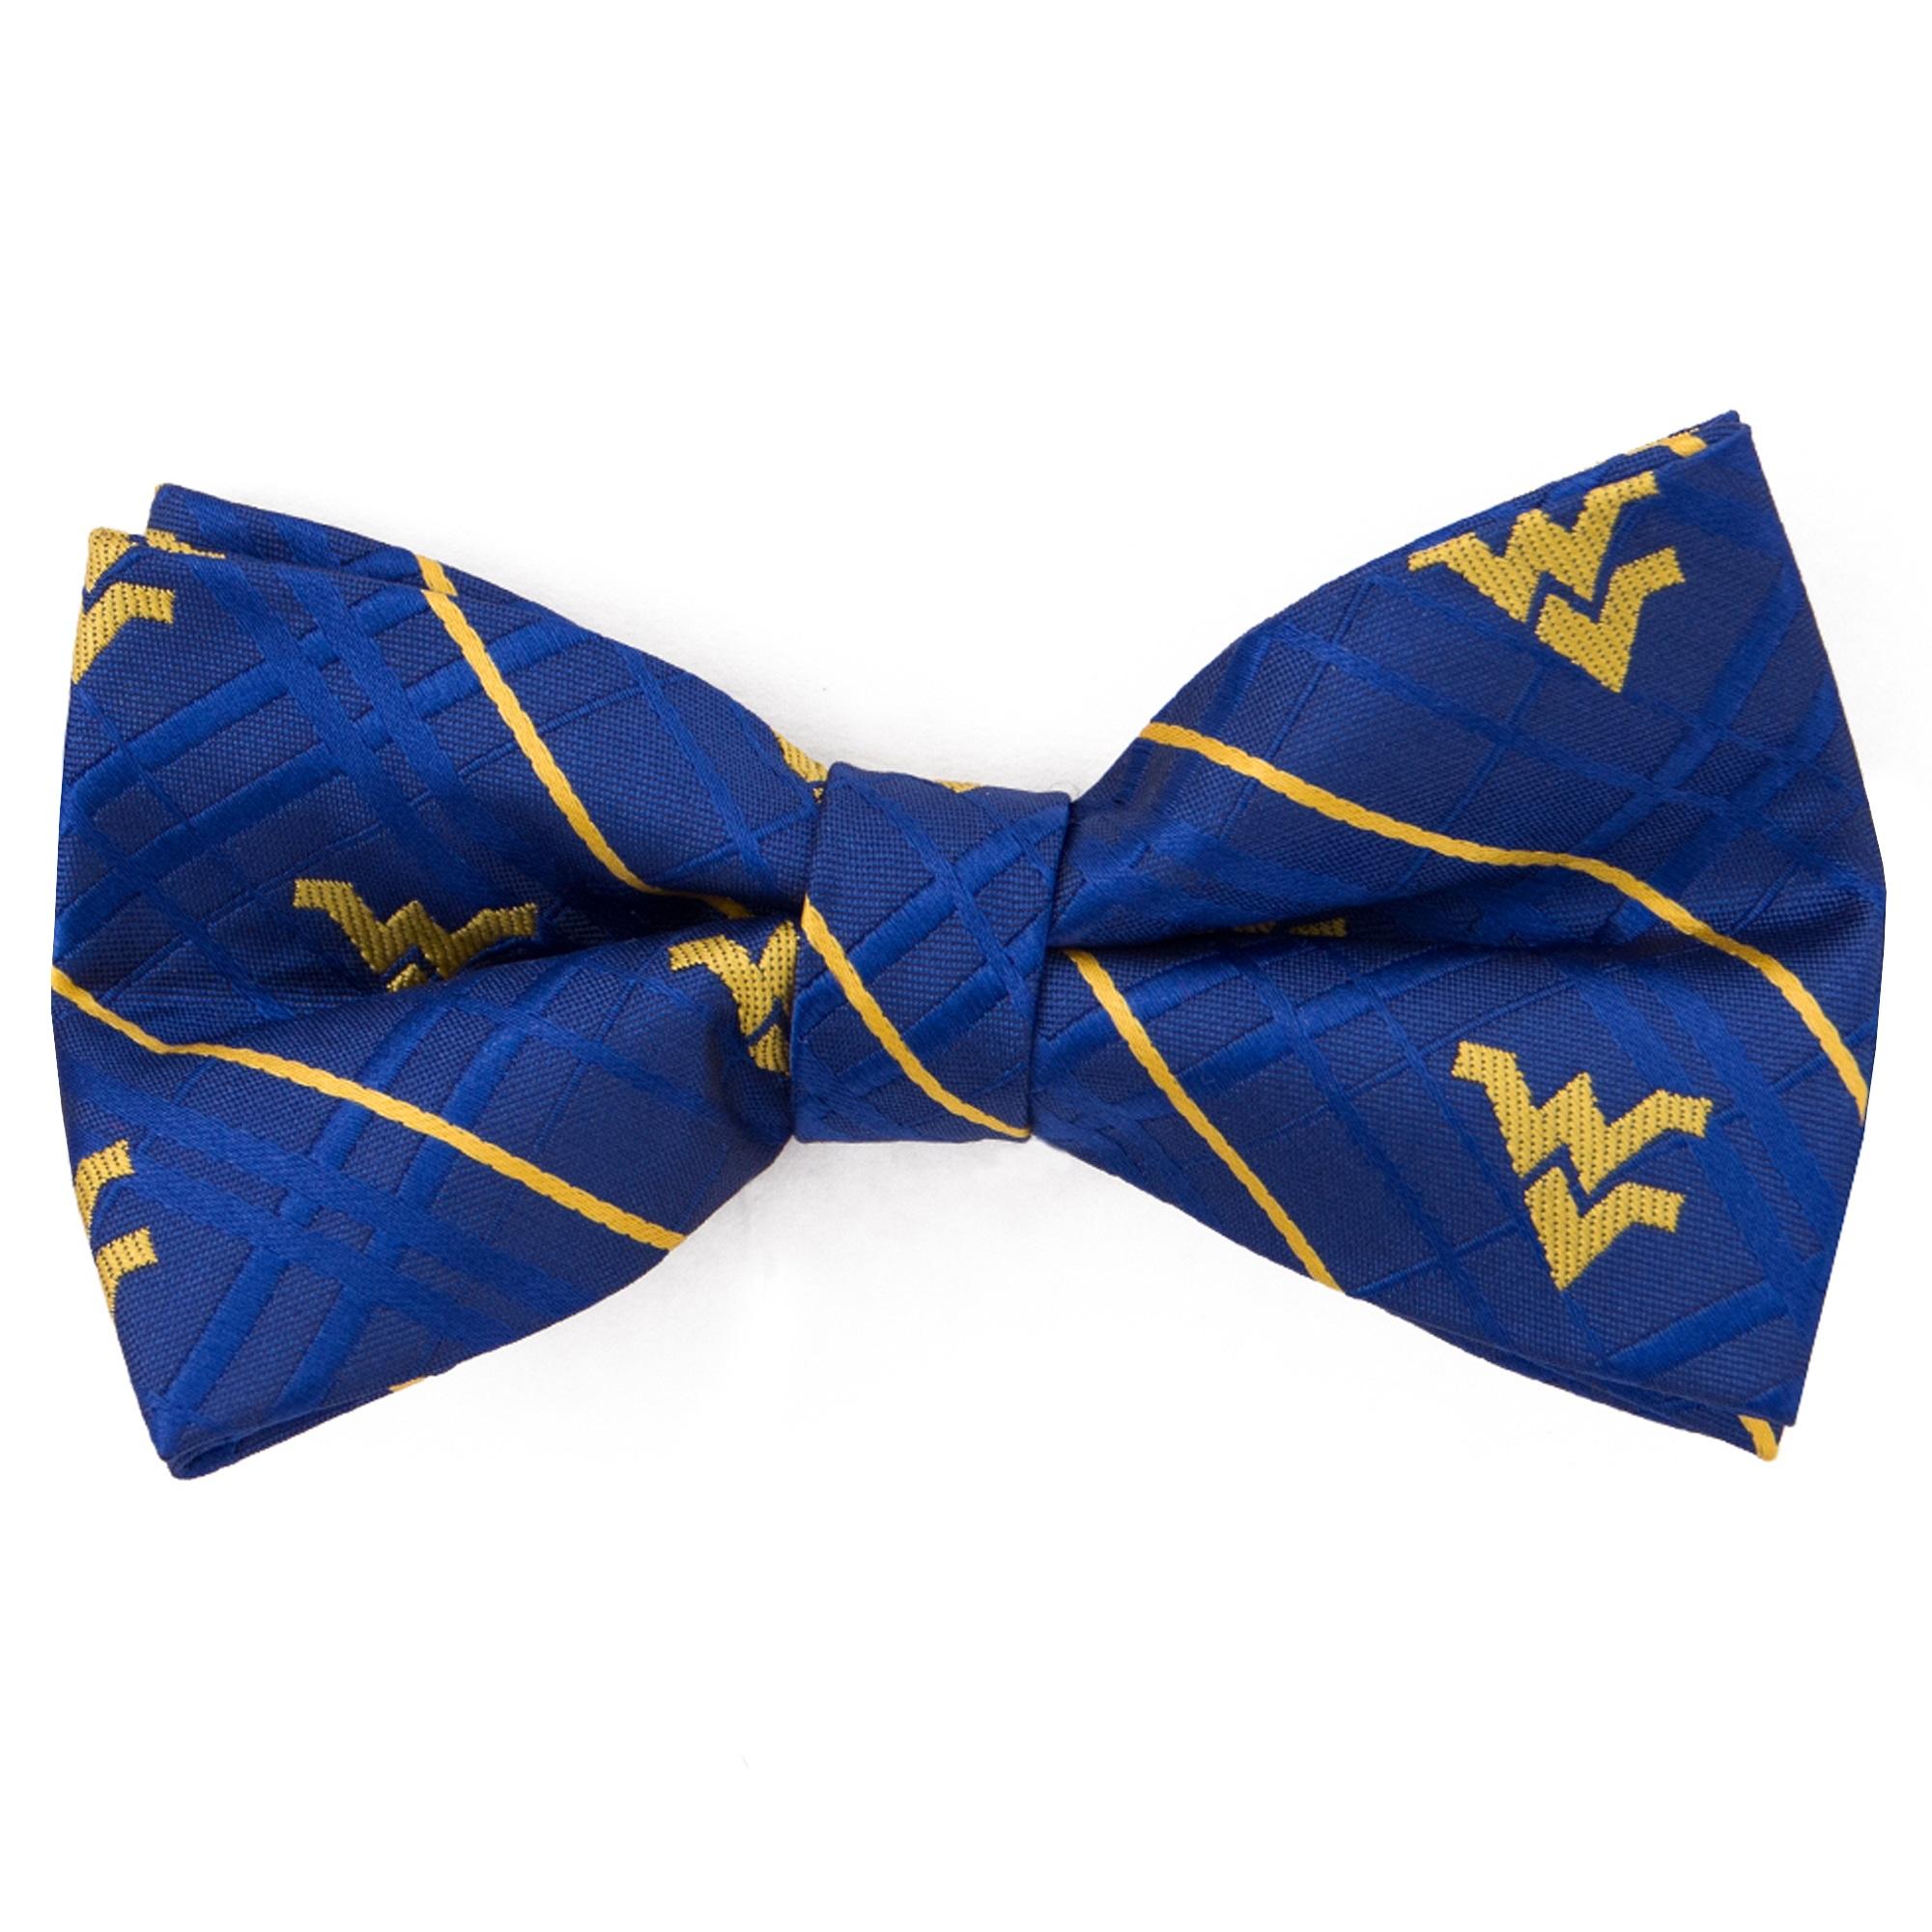 West Virginia University Oxford Bow Tie